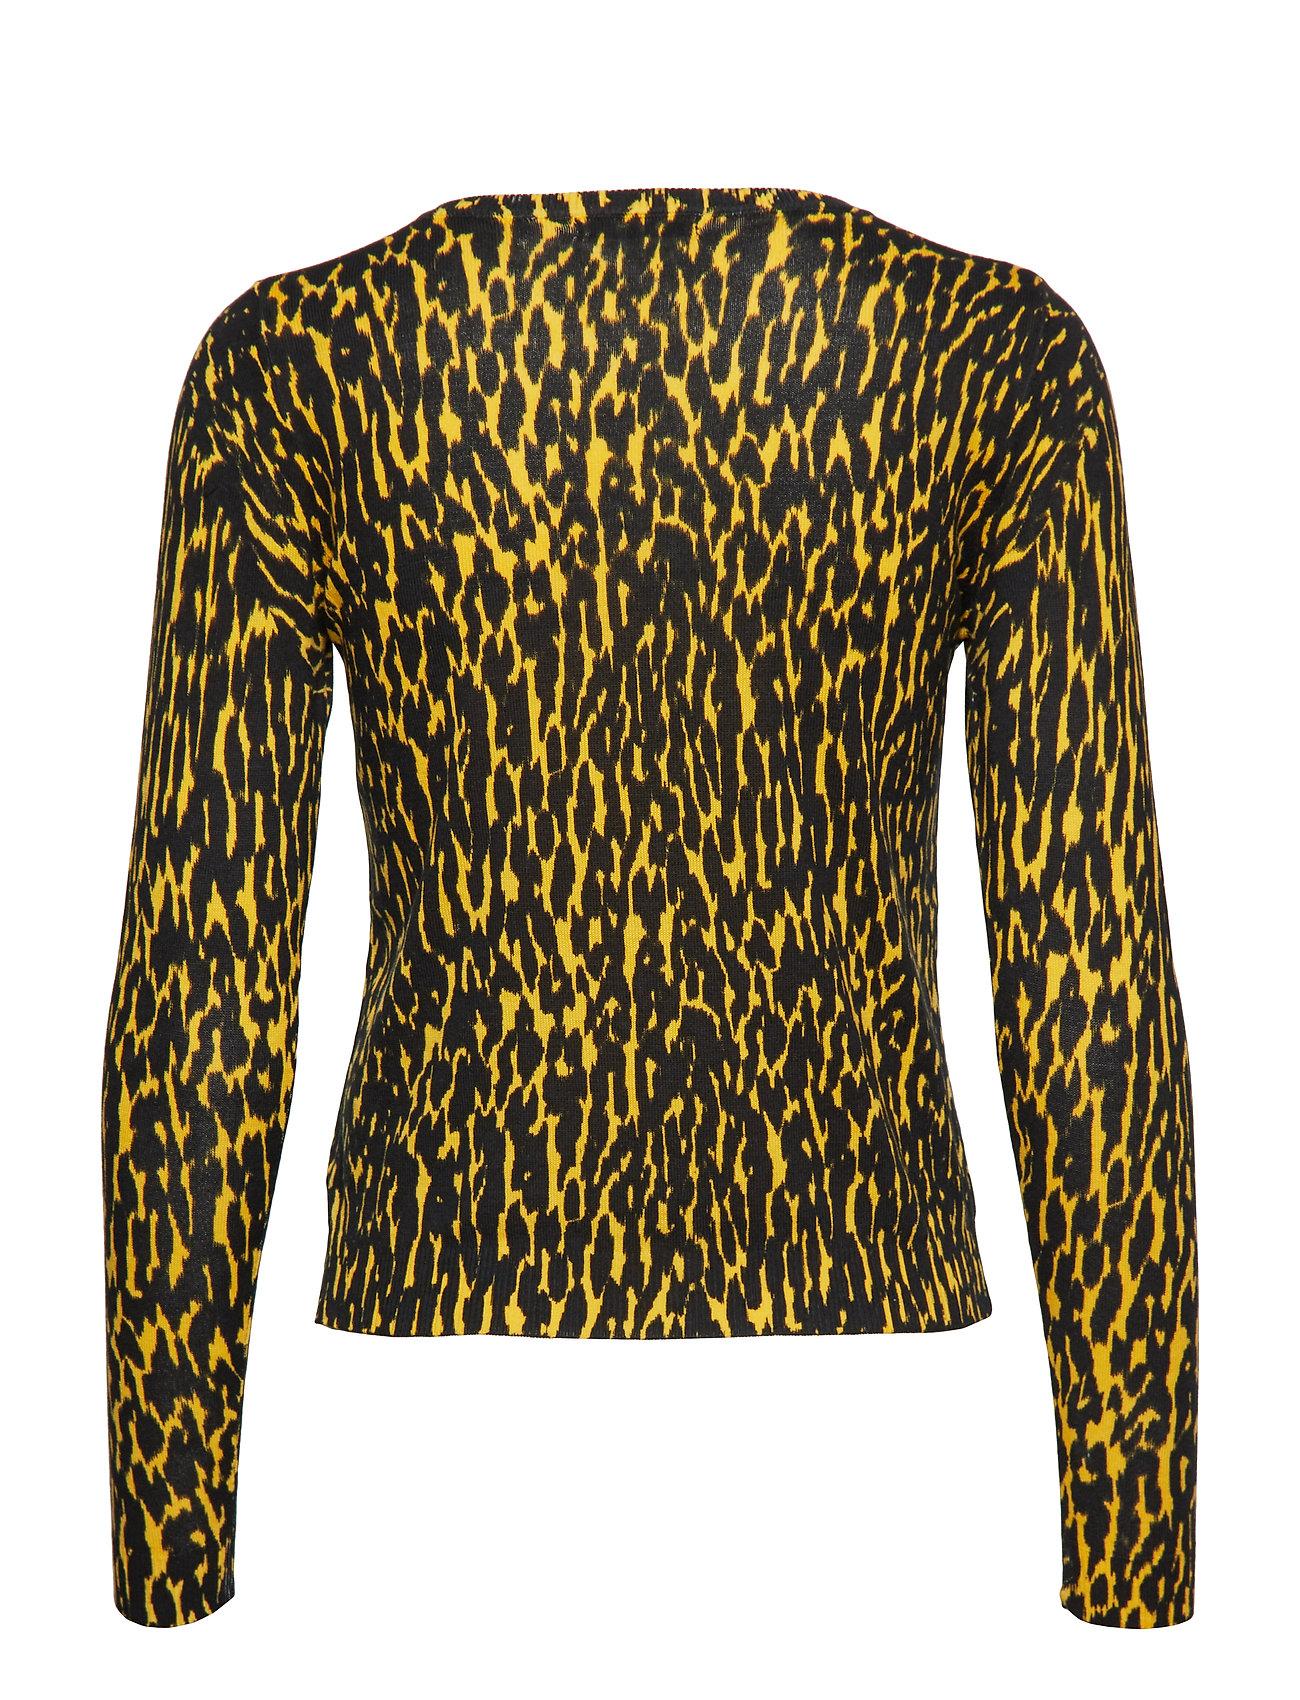 Jeans Cora Leopard BlkGuess Swtrgirly Cardi Ls BWCedrxo